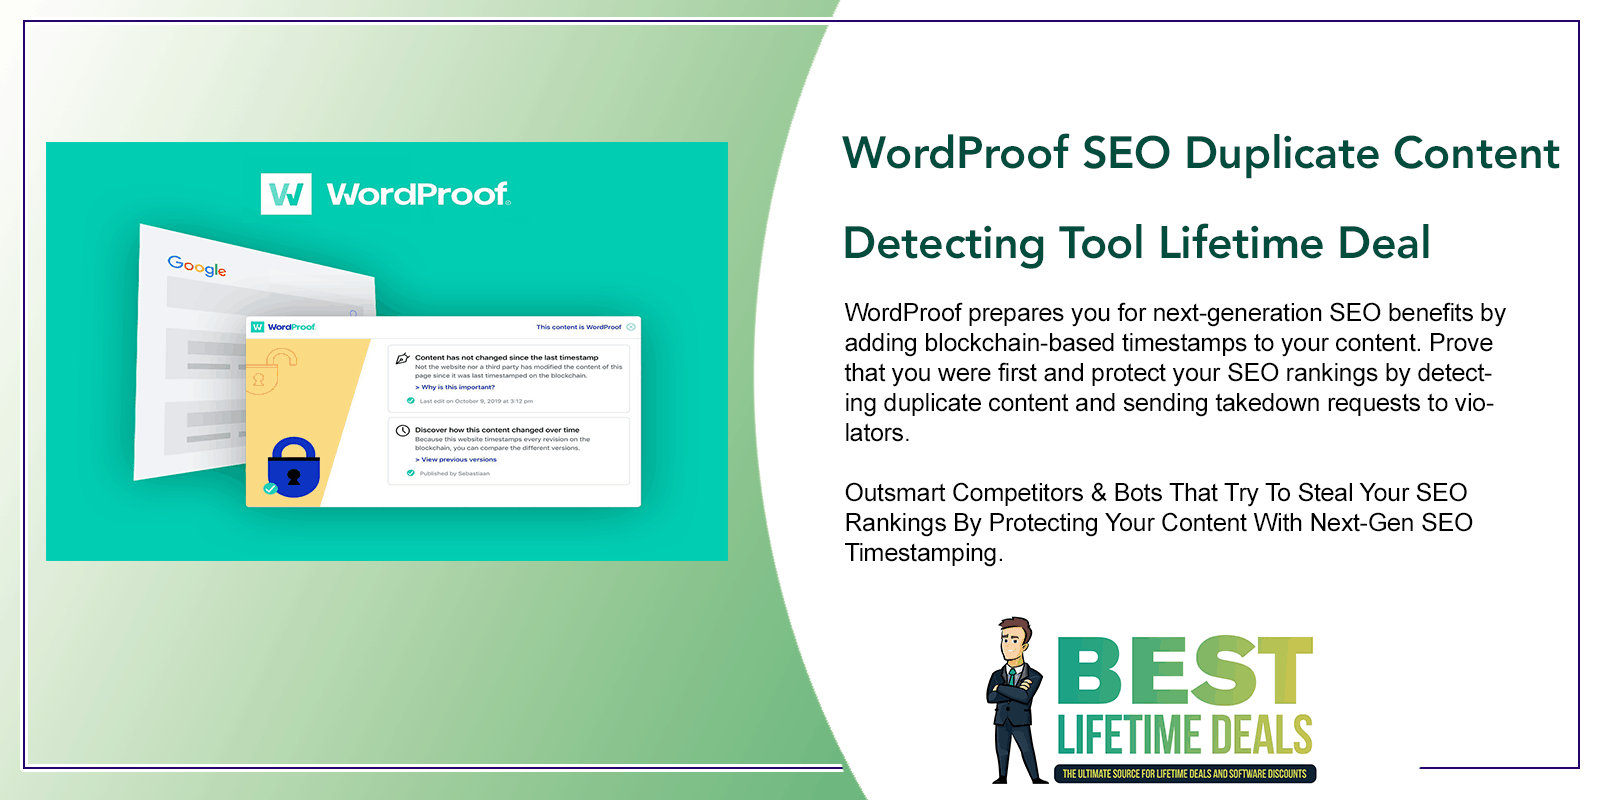 WordProof SEO Duplicate Content Detecting Tool Lifetime Deal